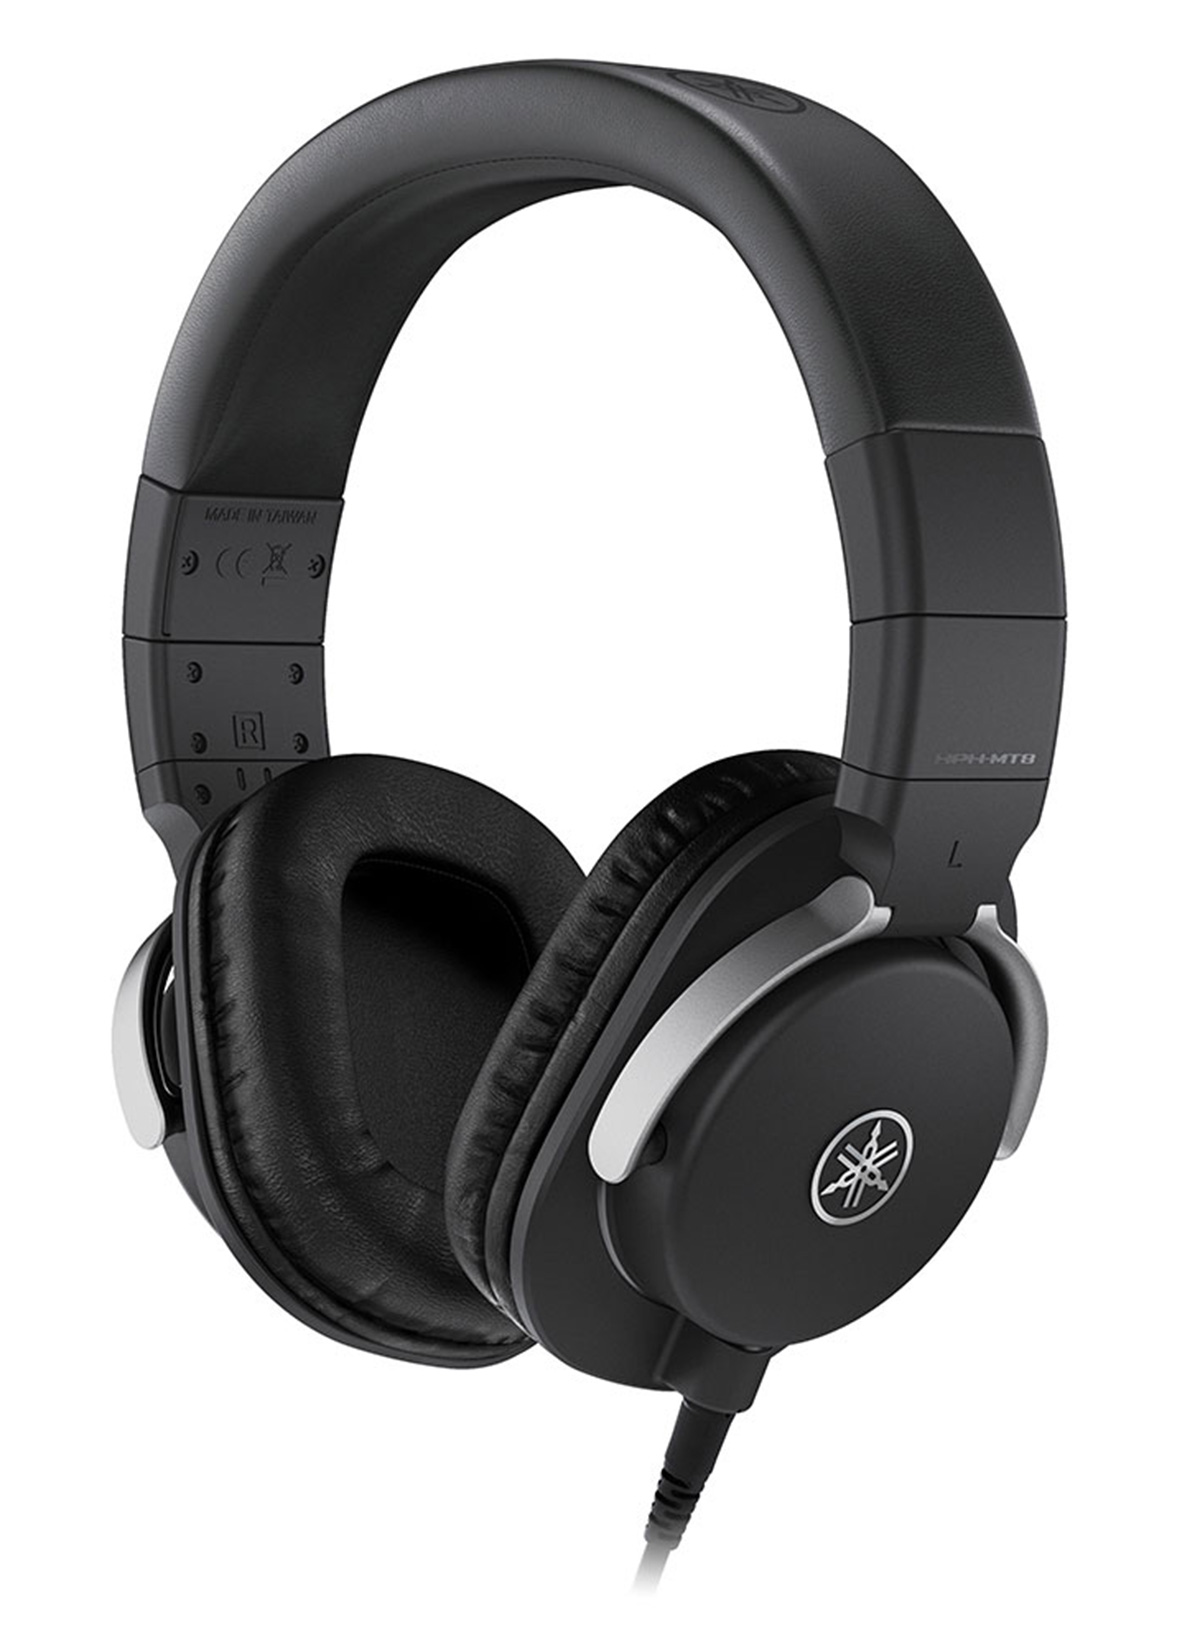 yamaha hph mt8 headphones black. Black Bedroom Furniture Sets. Home Design Ideas